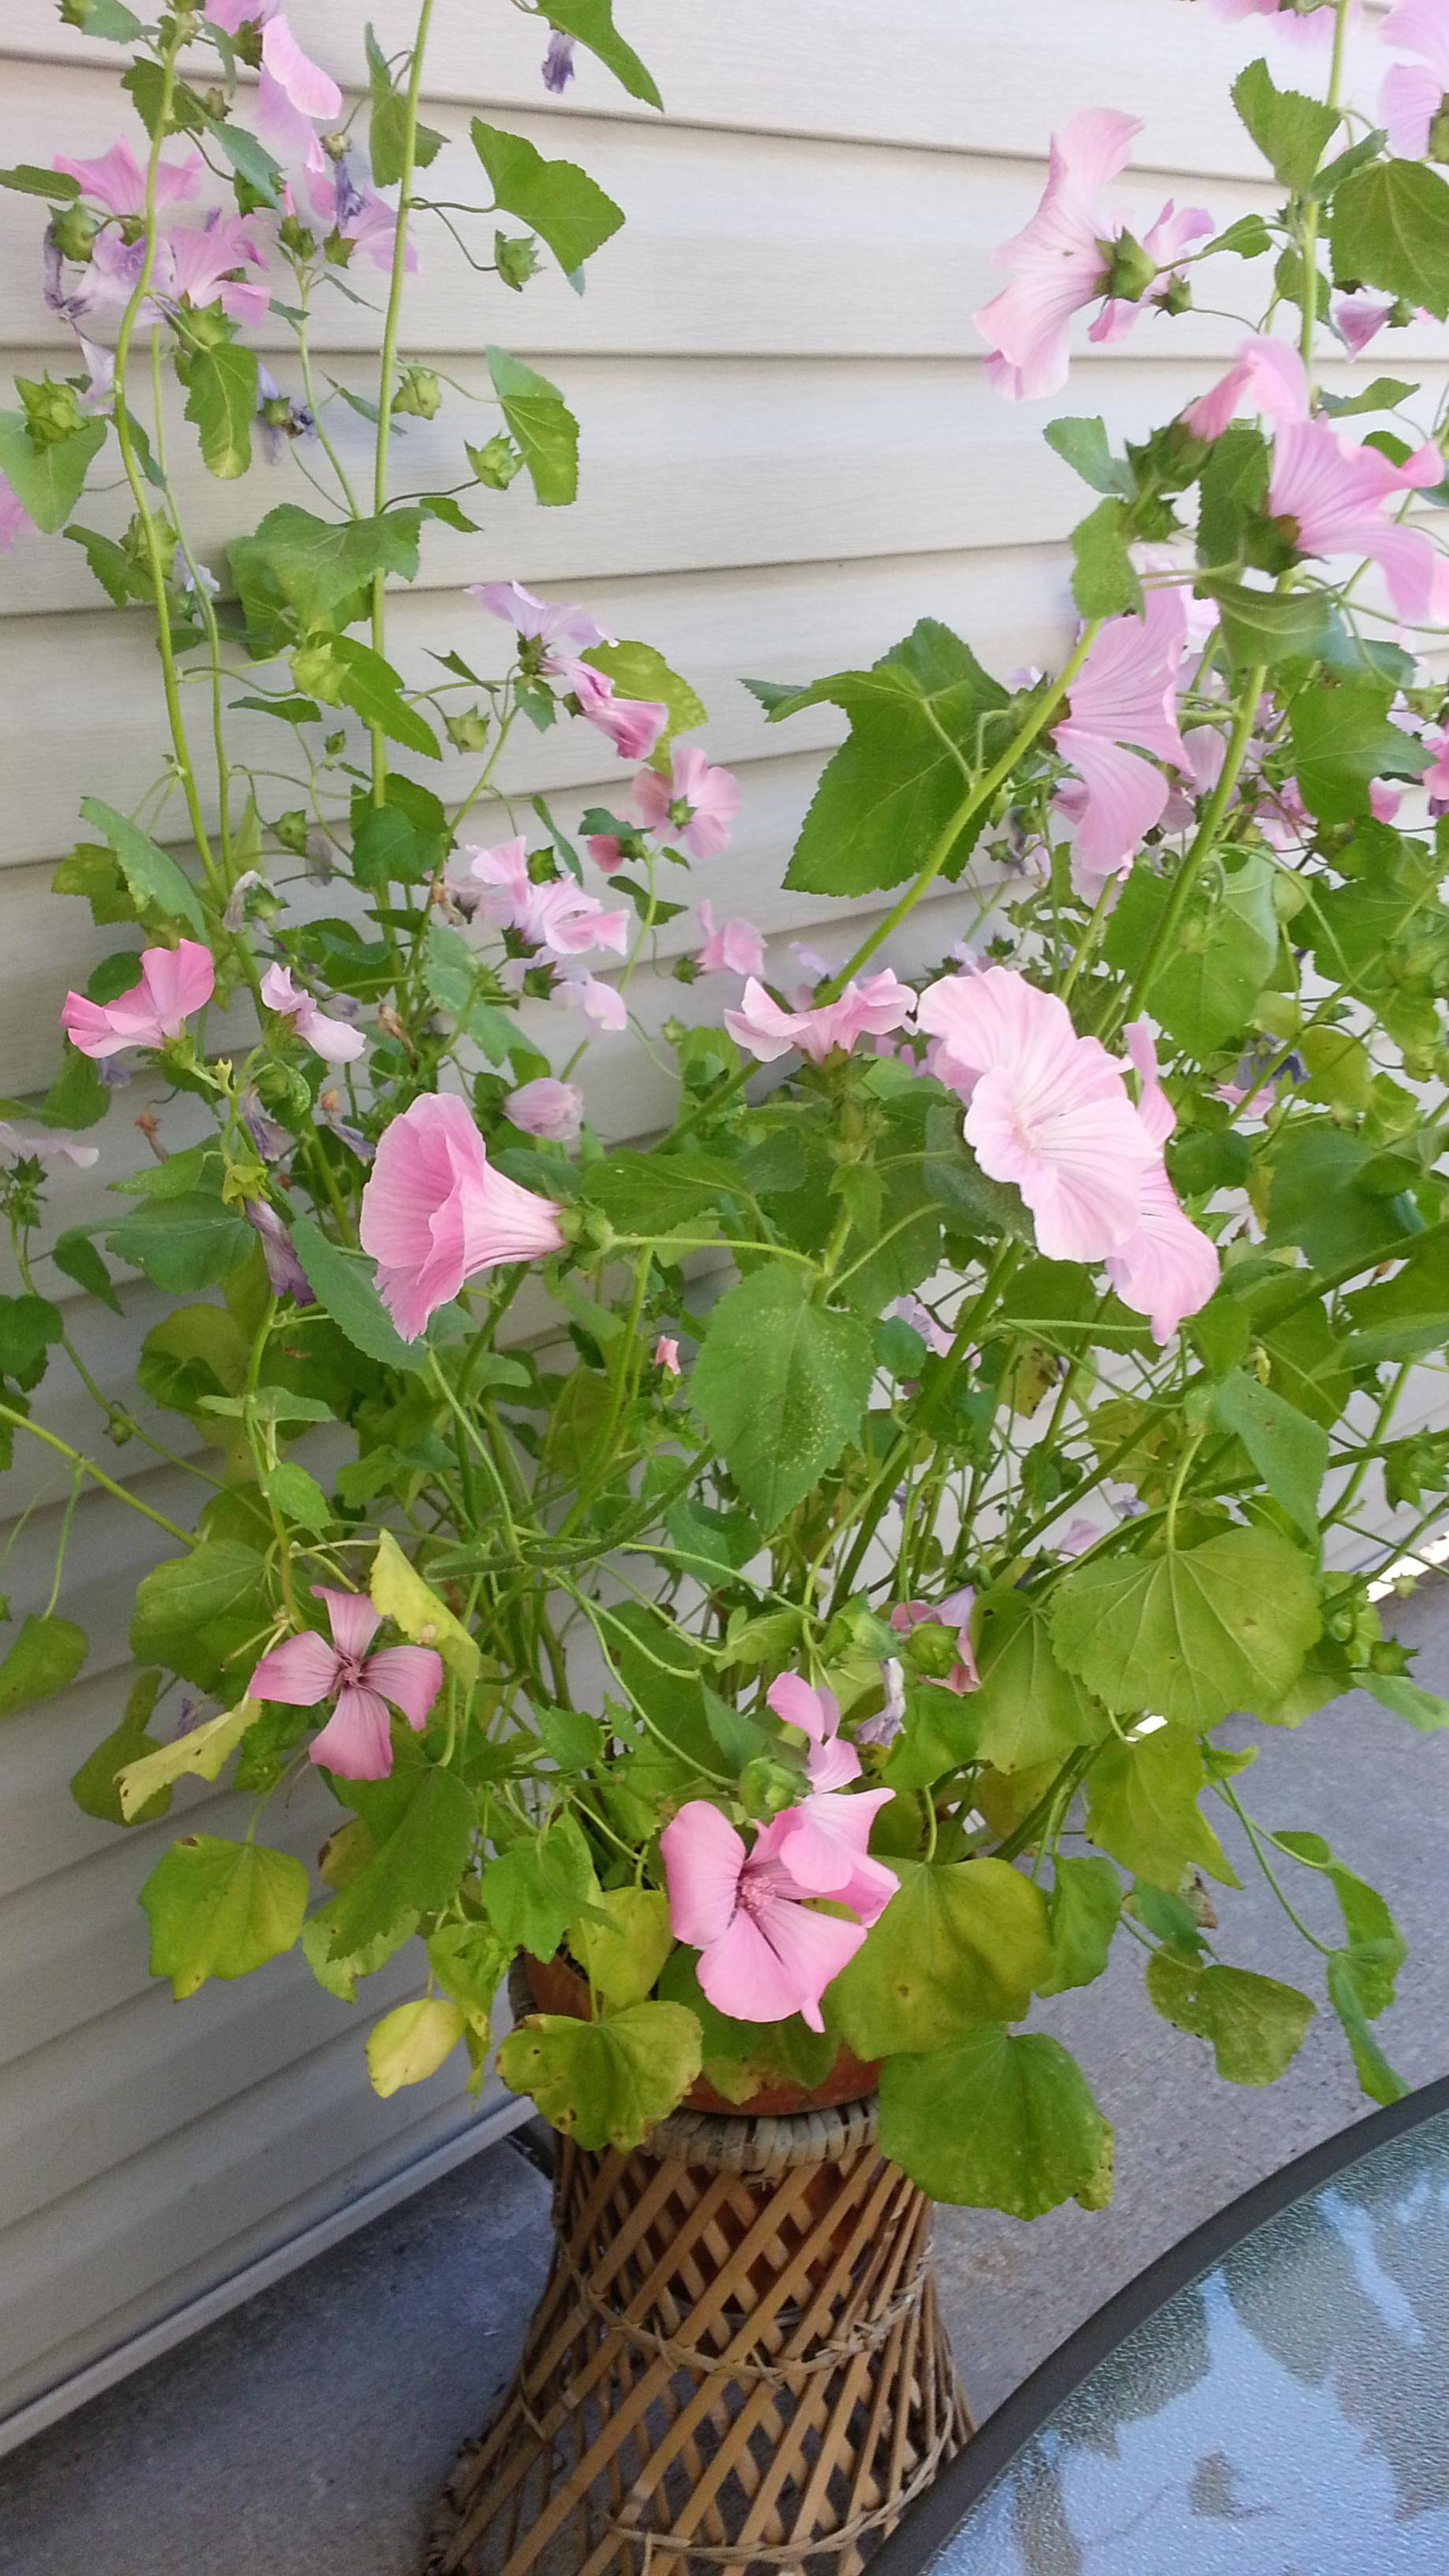 Best Kitchen Gallery: Identification Help Identifying This Pink Flowering Plant Native of Flowering Houseplants Identification on rachelxblog.com